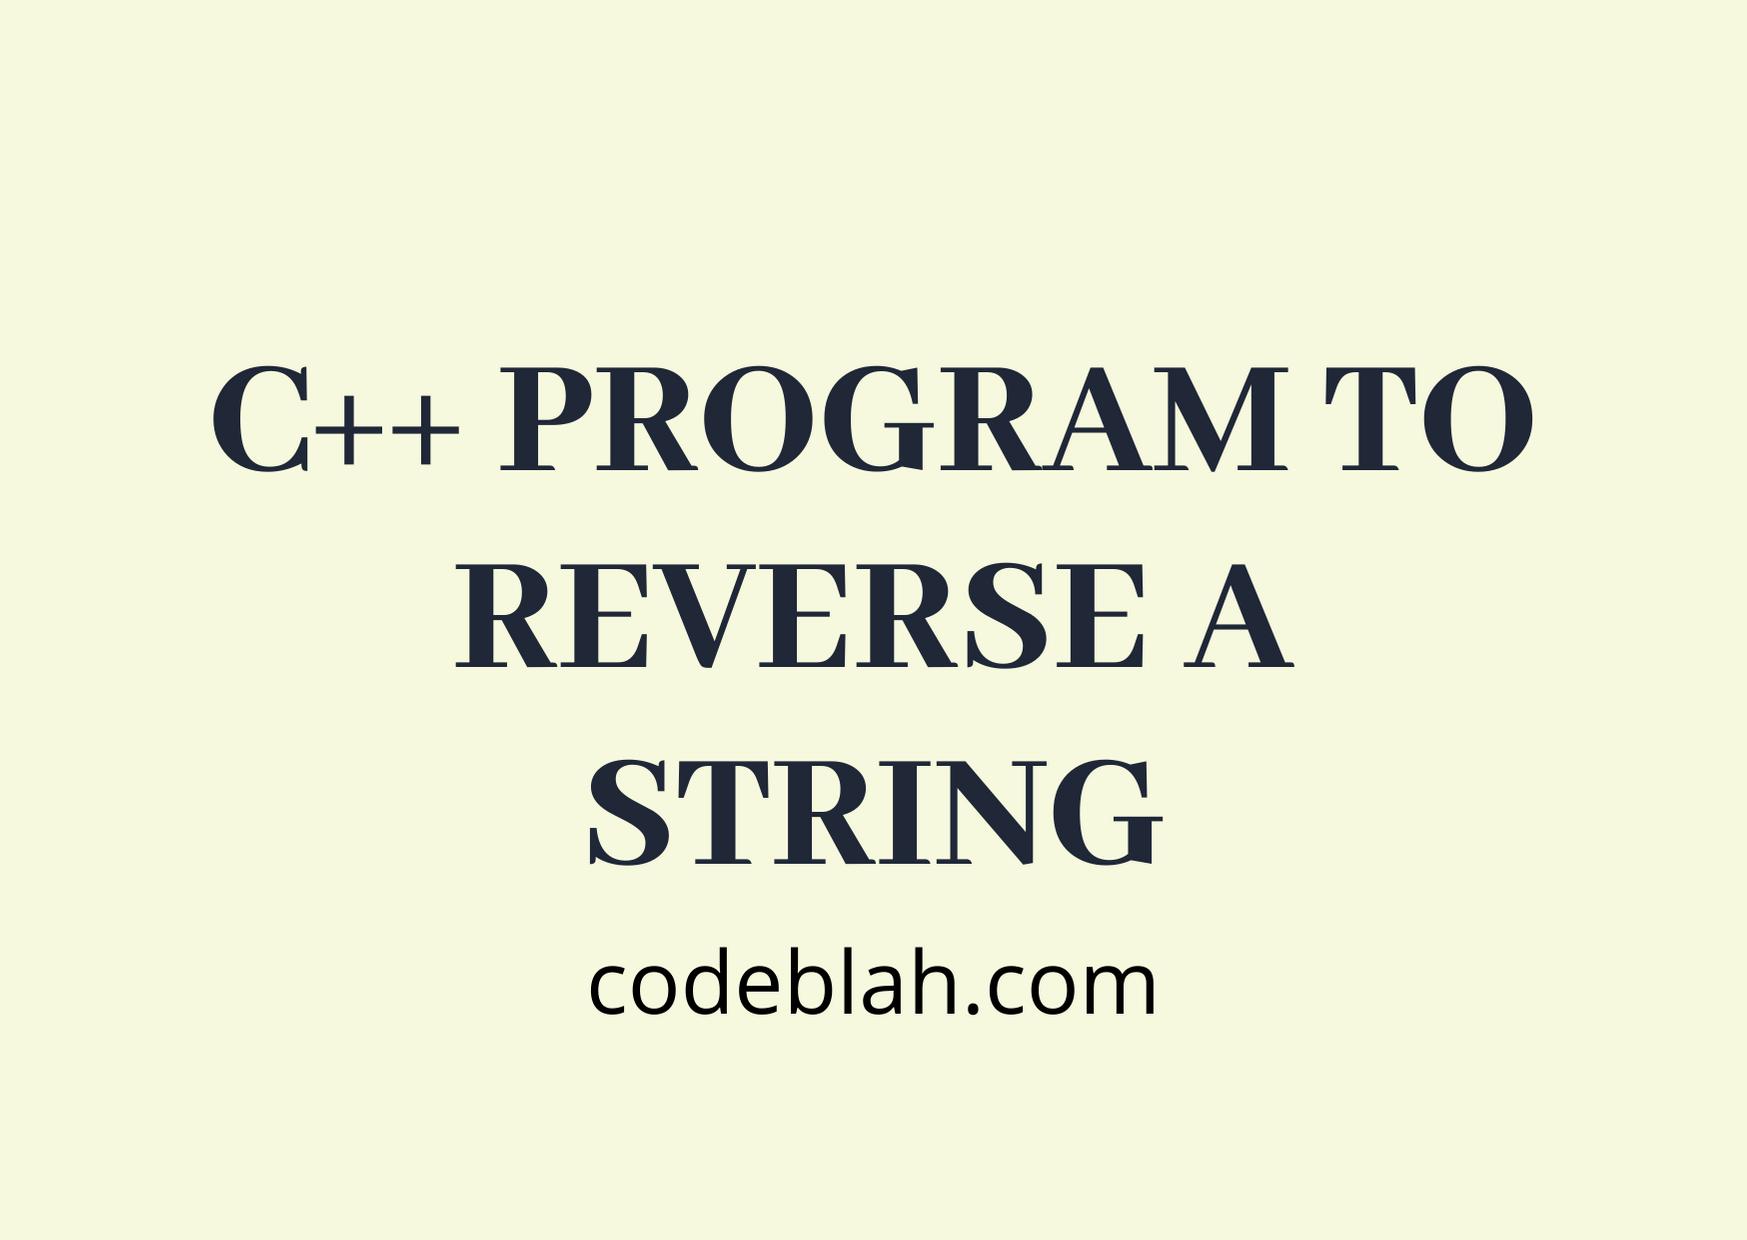 C++ Program to Reverse a String